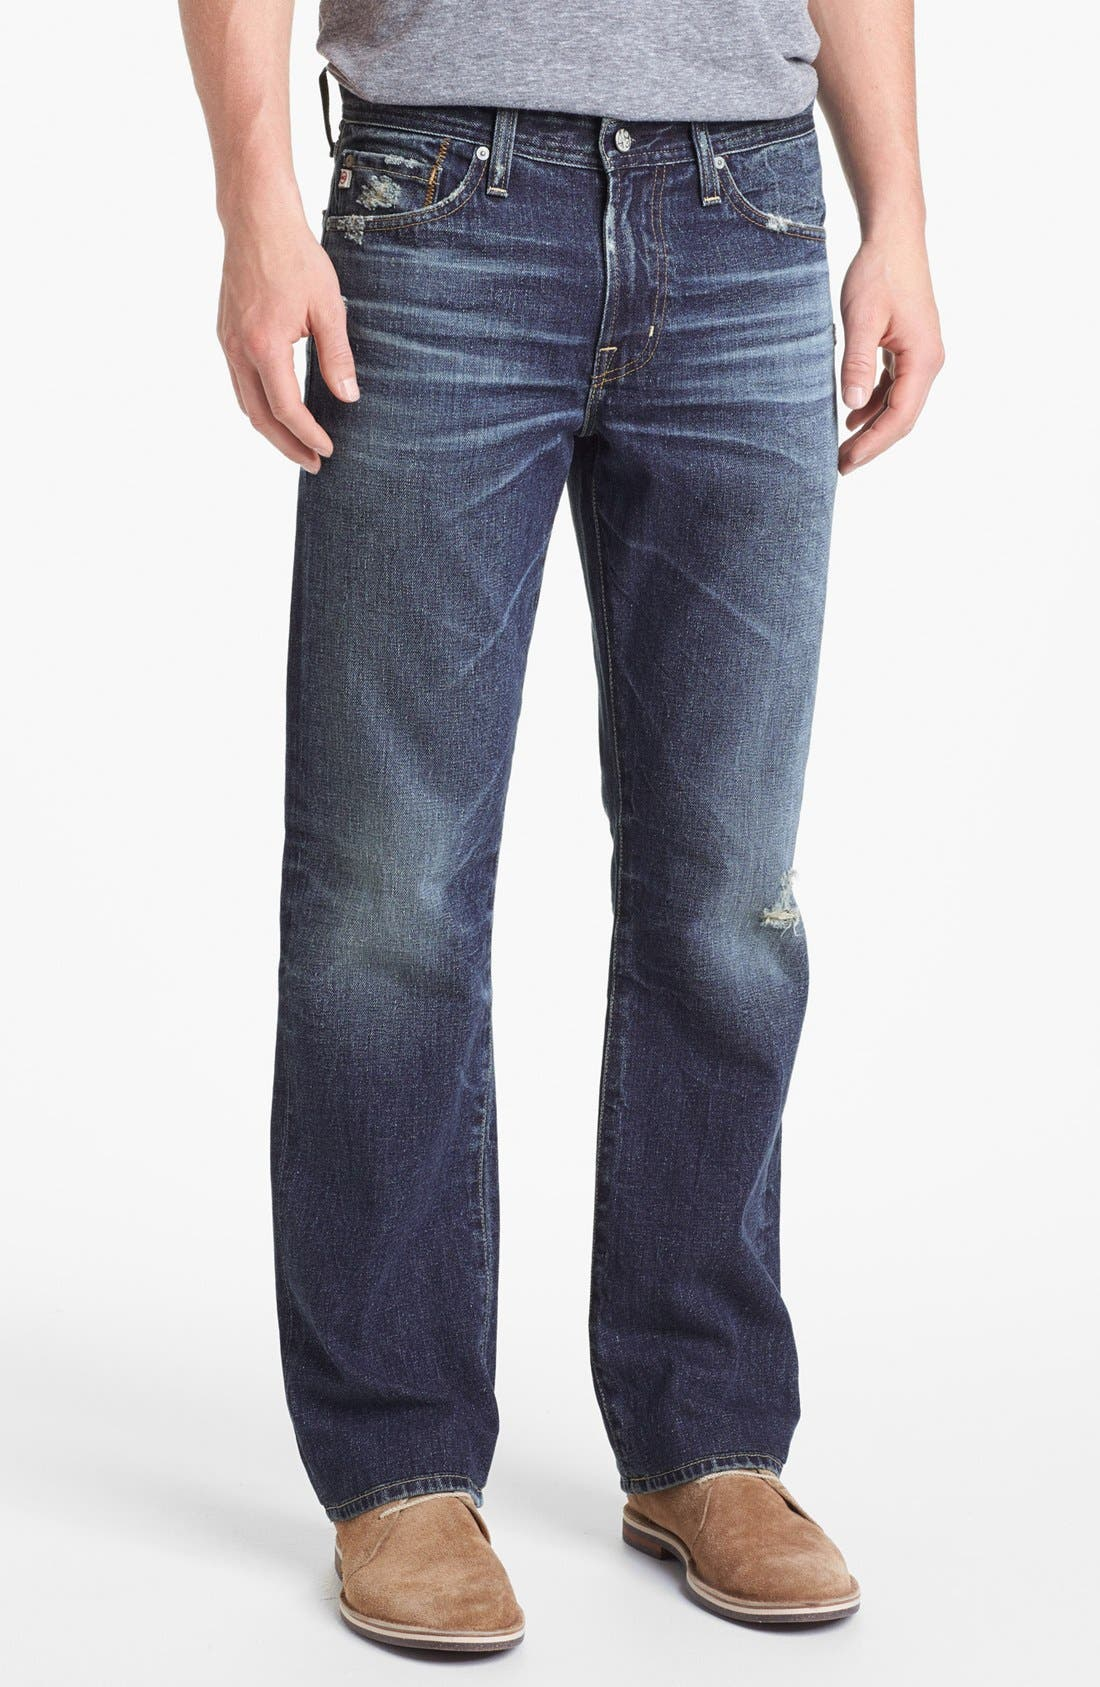 Alternate Image 1 Selected - AG 'Protégé' Straight Leg Jeans (17-Years Original)